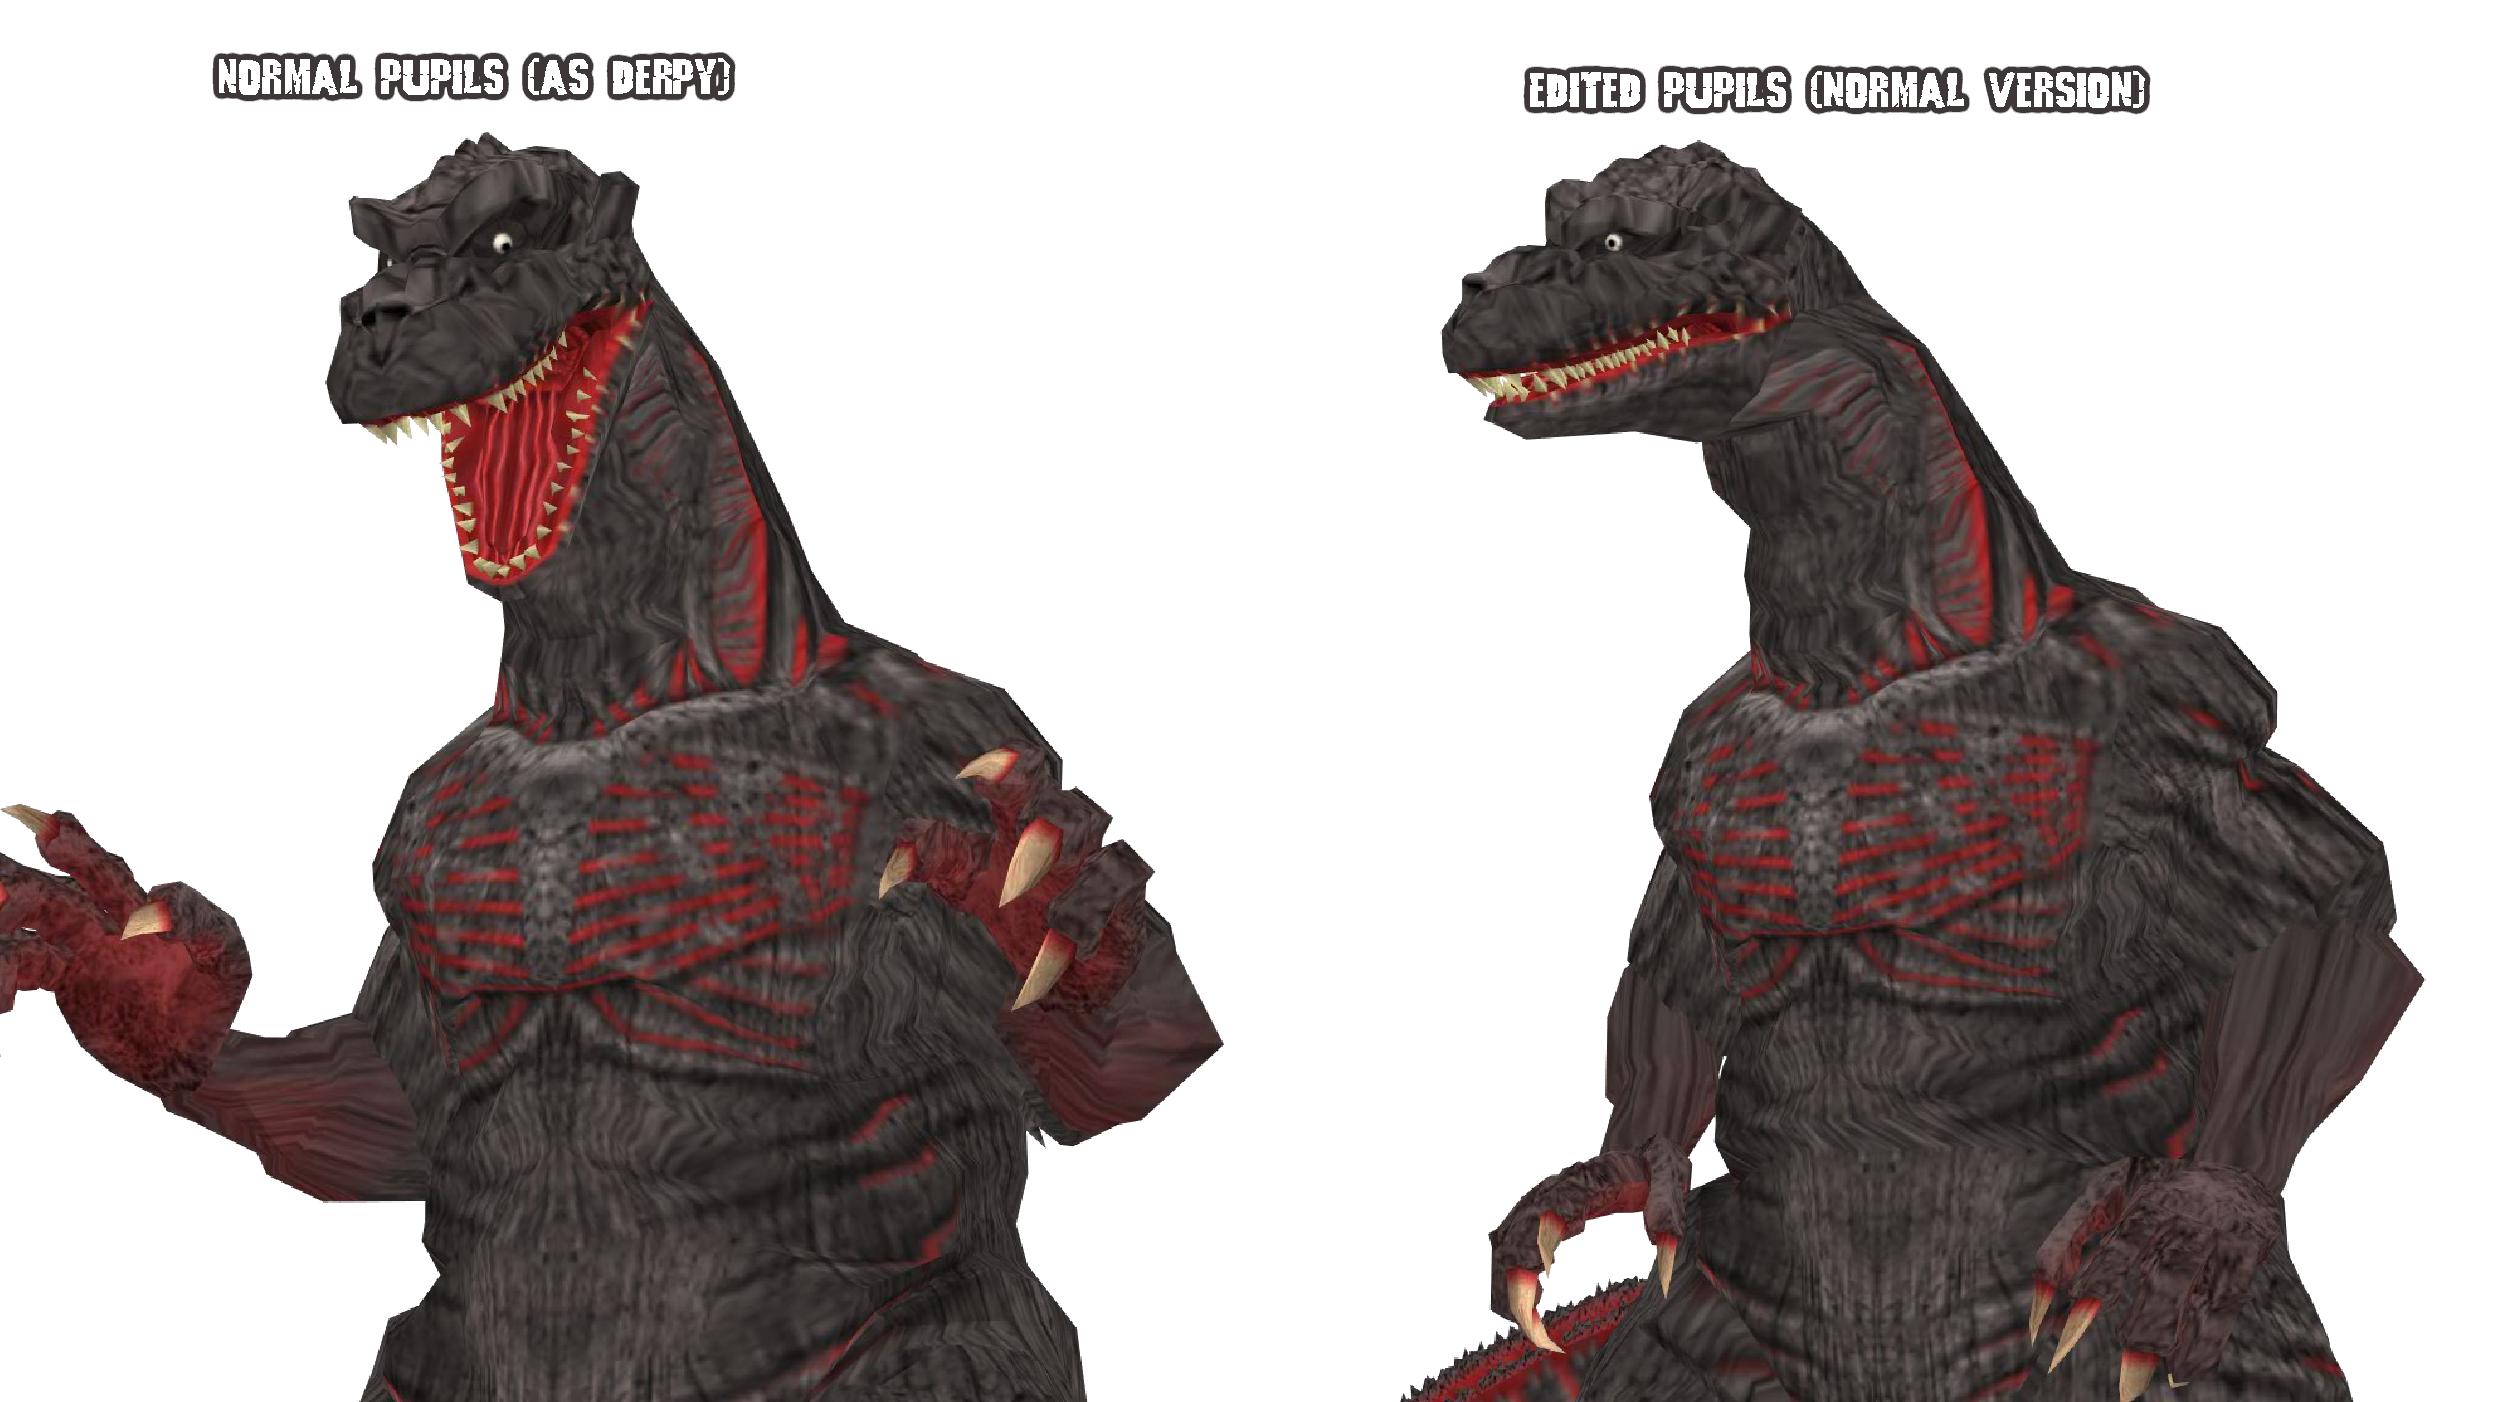 My Shin Godzillau0027s Pupil By AsylusGoji91 My Shin Godzillau0027s Pupil By  AsylusGoji91